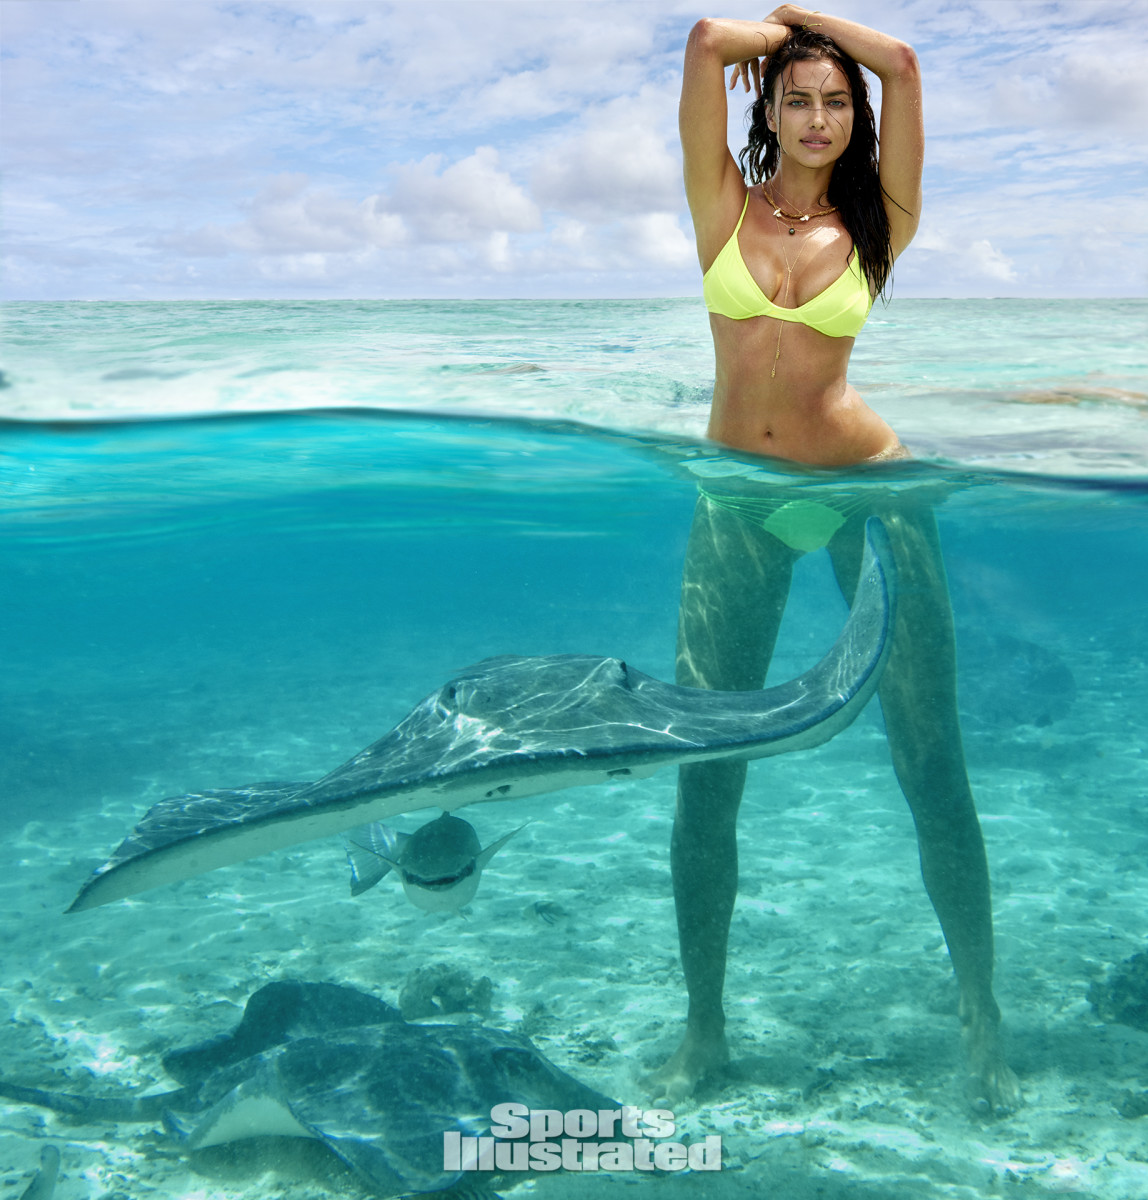 Irina Shayk 2016 web X159793_TK1_01387-rawWMFinal1920.jpg